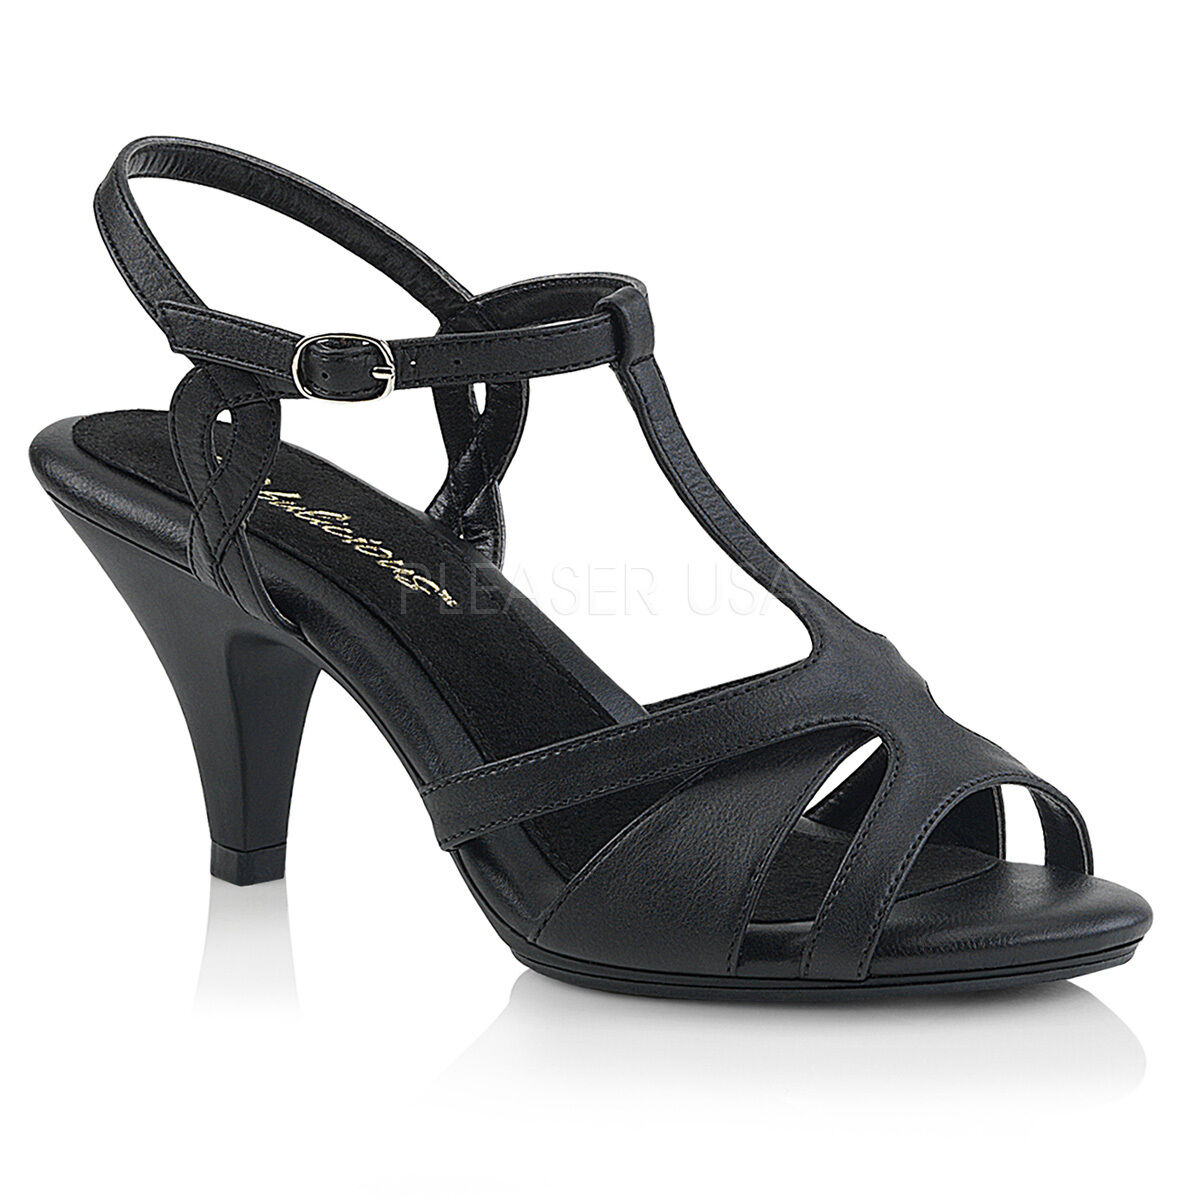 PLEASER Sexy Low 3  Heels T-Strap Black Matte Sandals shoes w  Ankle Strap